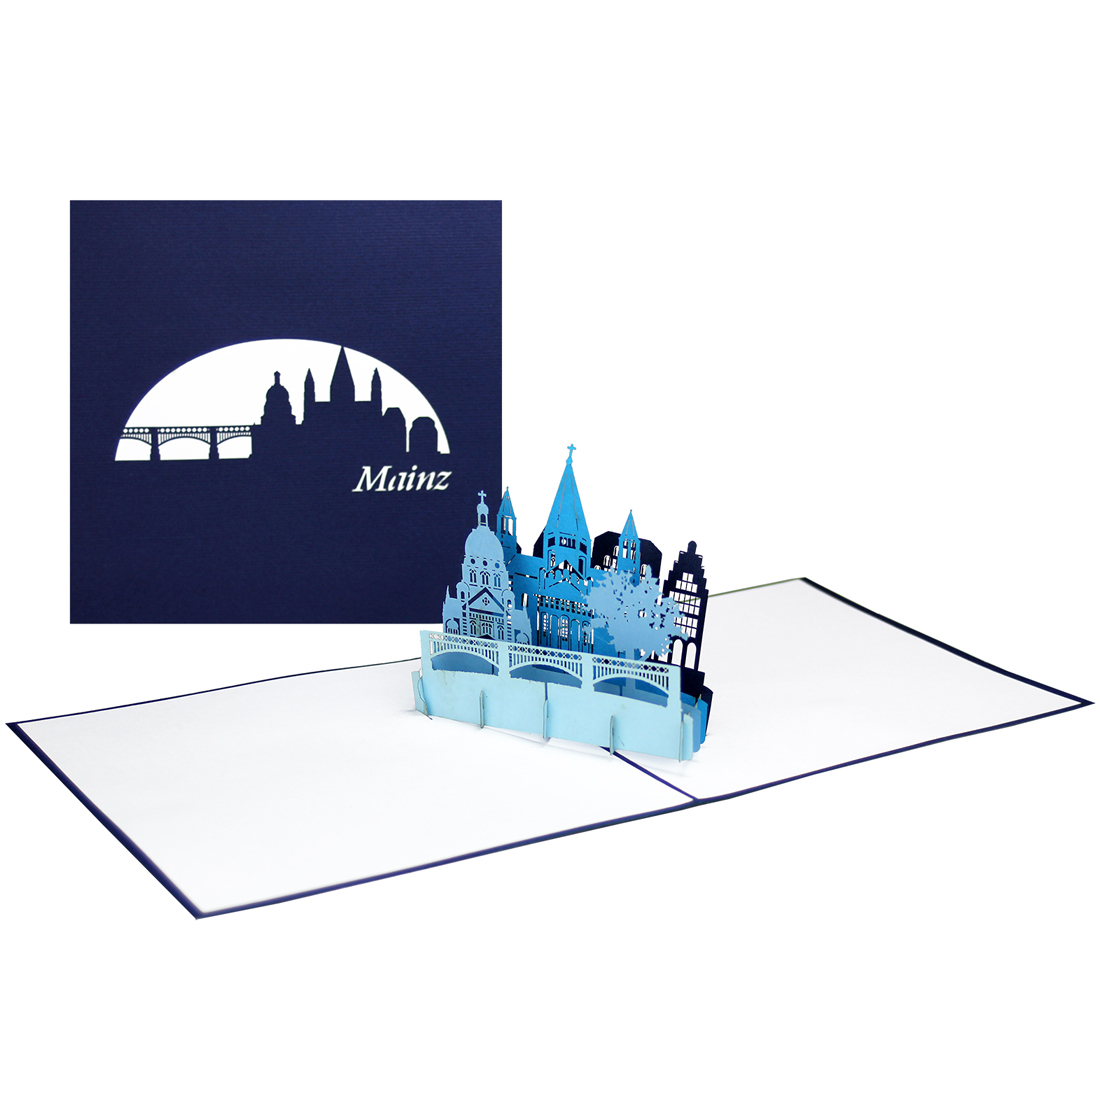 "Pop Up Karte ""Mainz"" - Souvenir, Geburtstagskarte. Grusskarte"